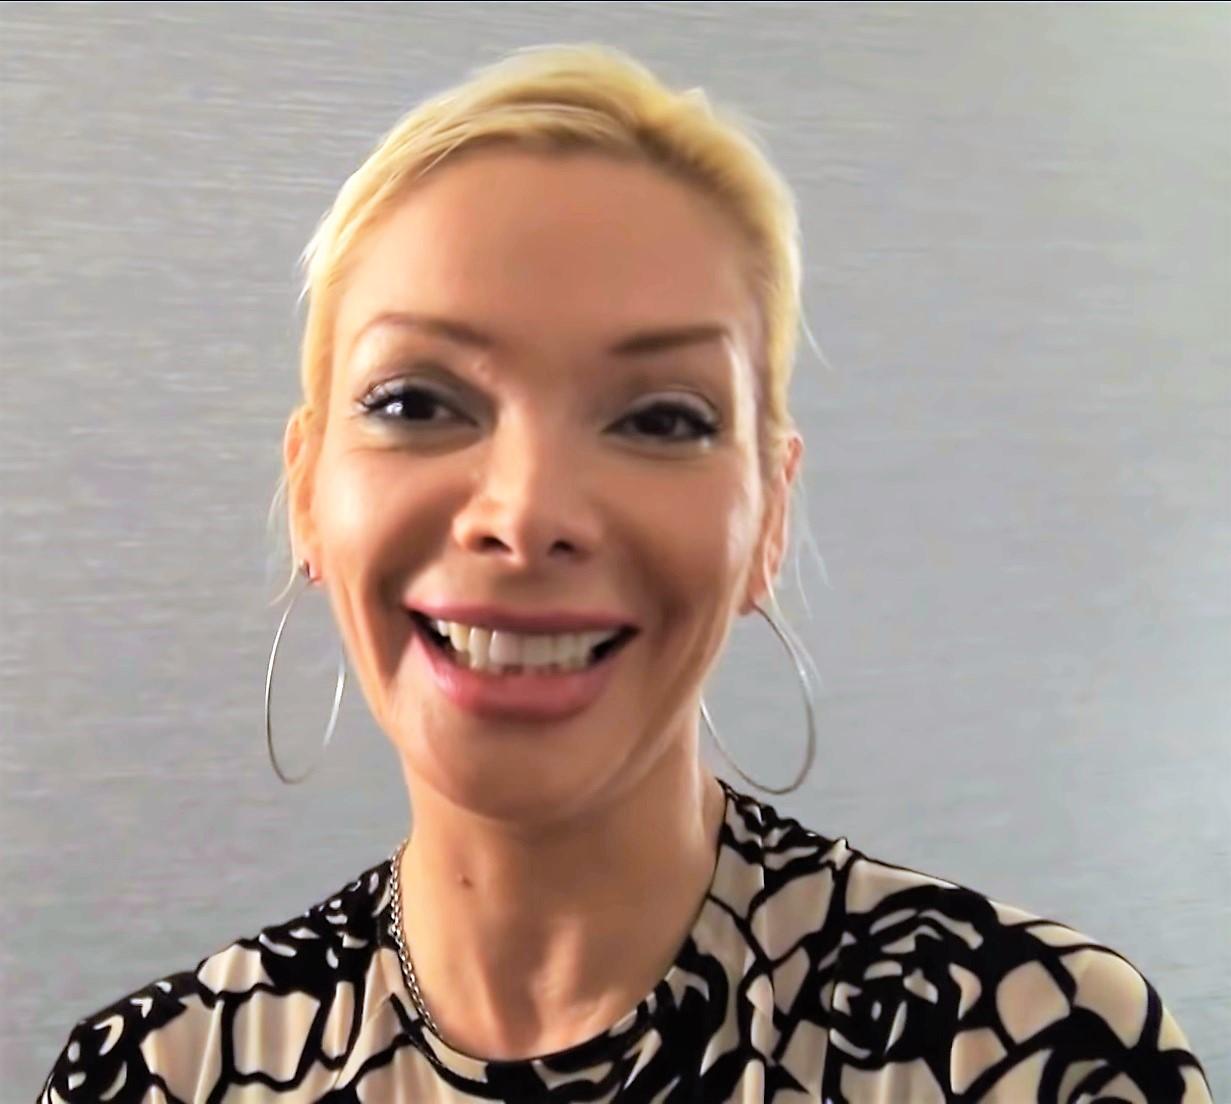 Marisela (cantante) - Wikipedia, la enciclopedia libre